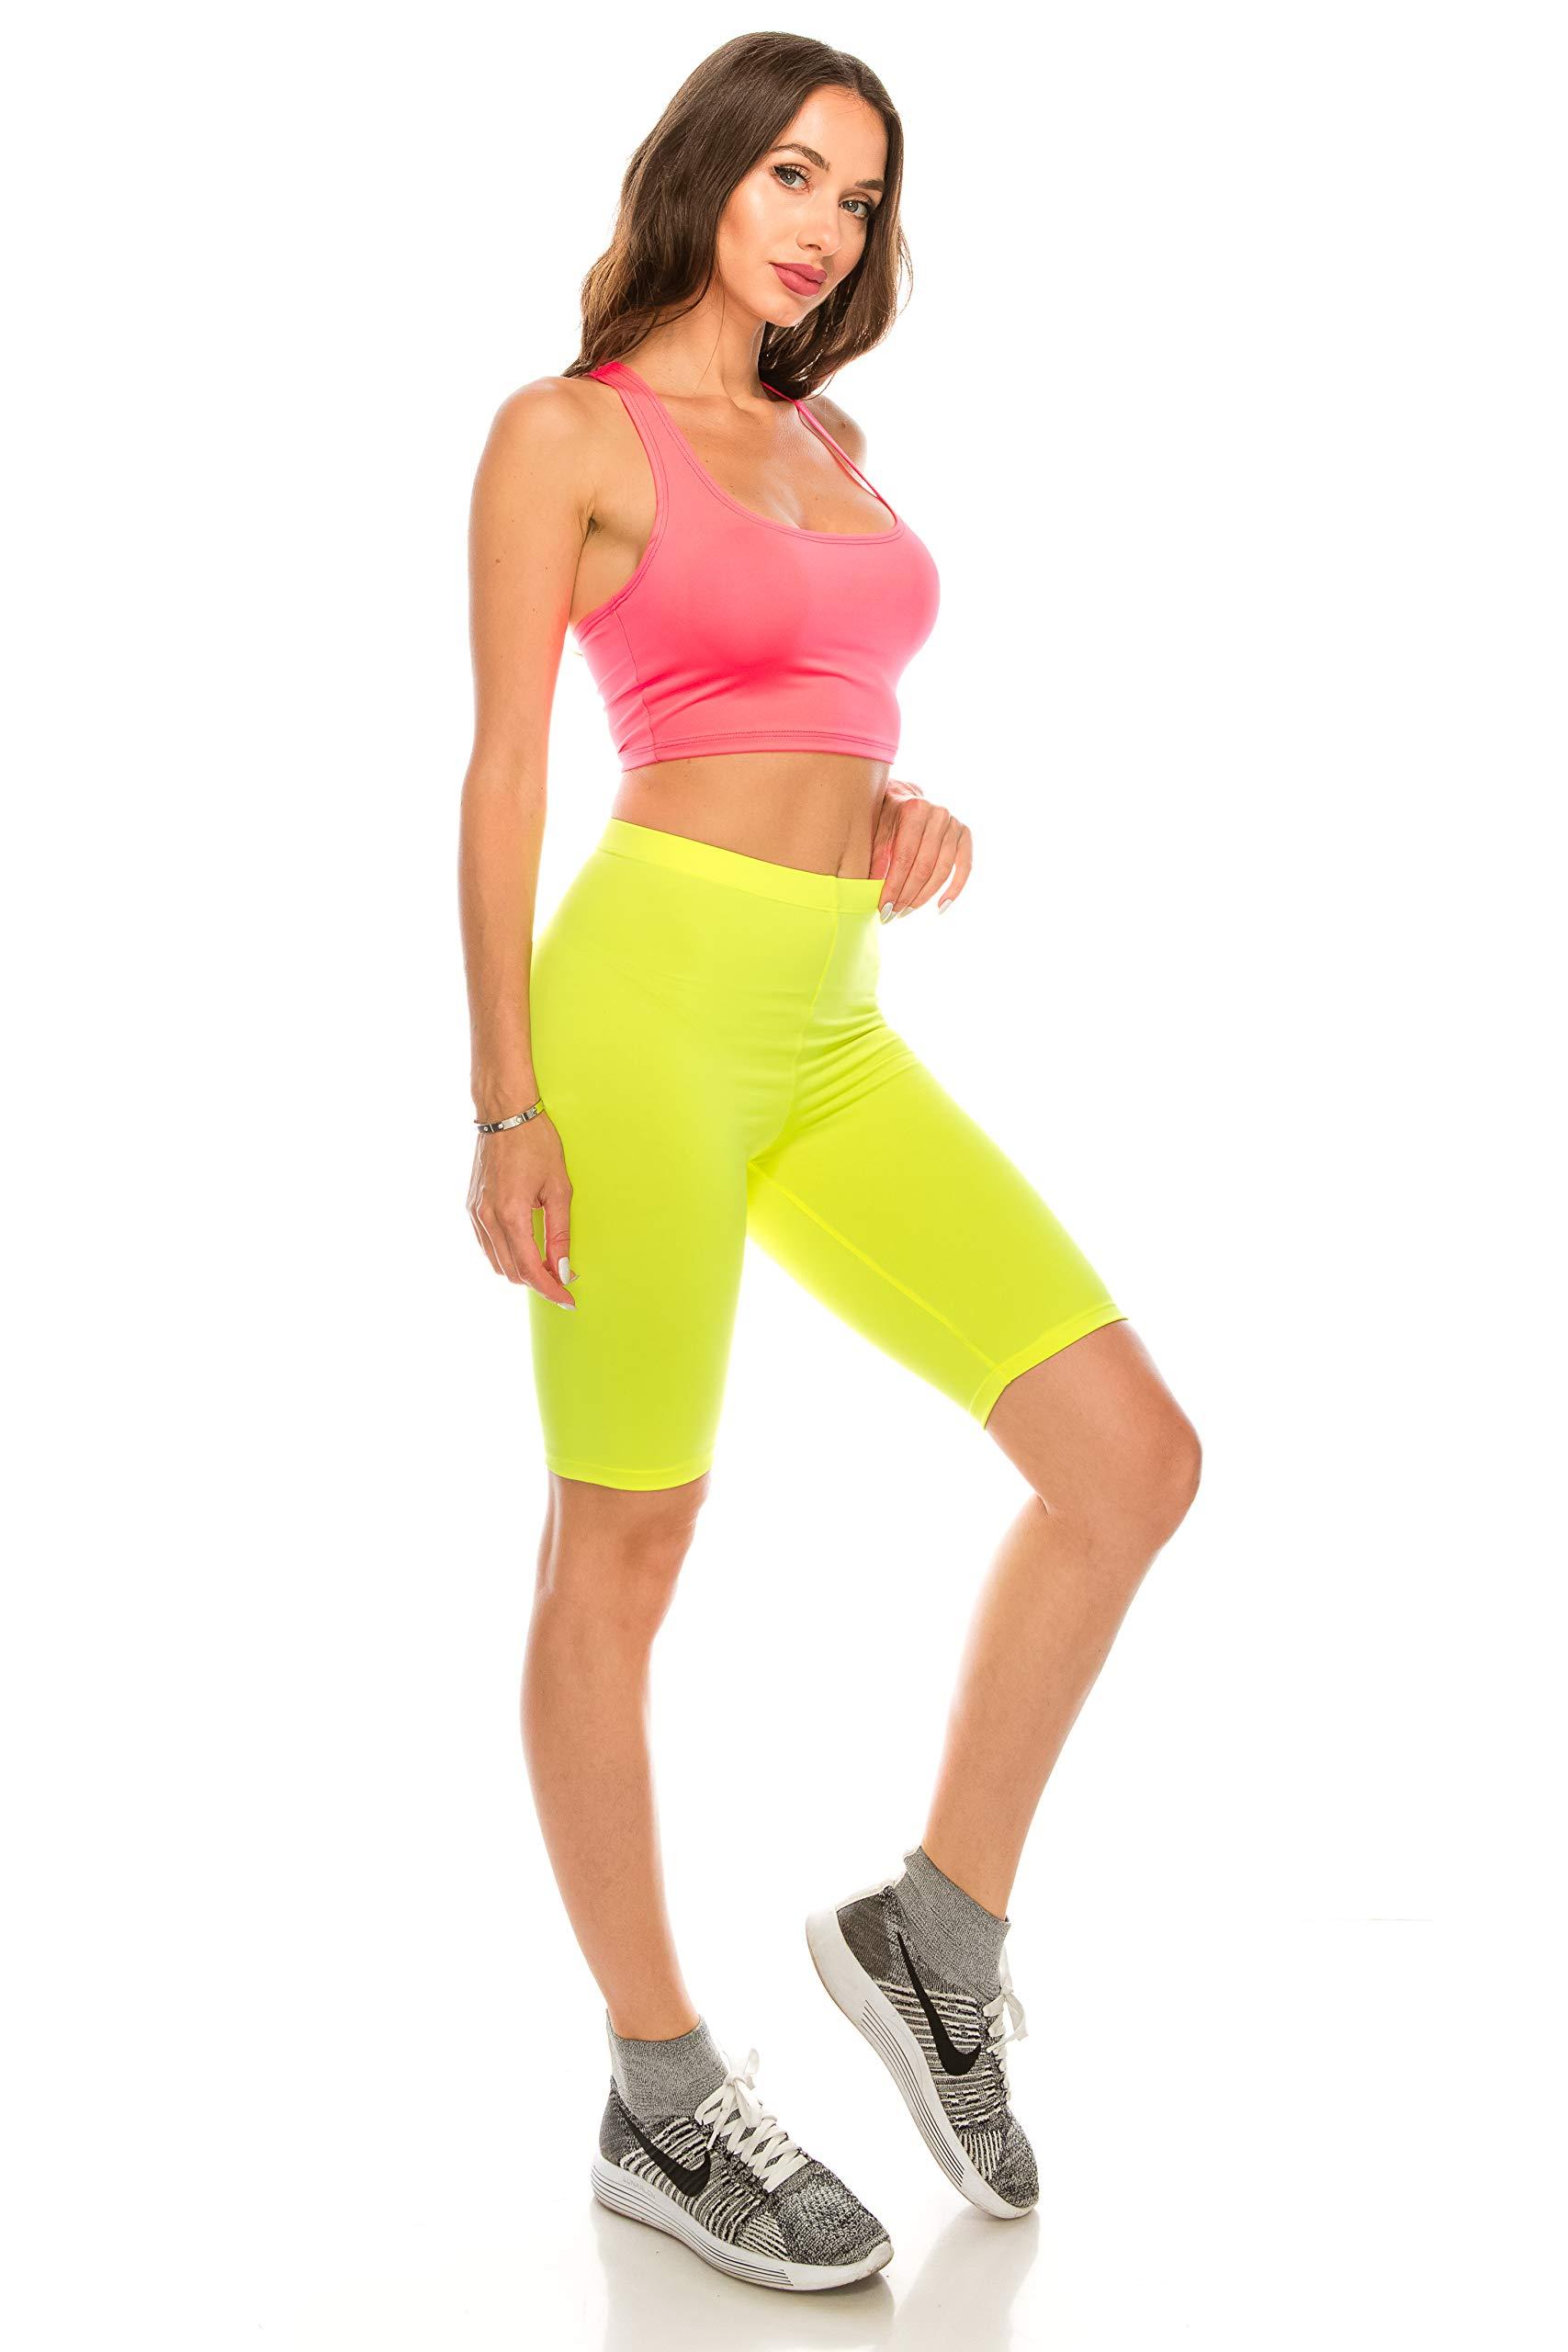 CNC STYLE B002 Women's Tank Crop Top Stretch Active Bodycon Long Bike Shorts w Piece Set, Pink Yellow, Medium by CNC STYLE